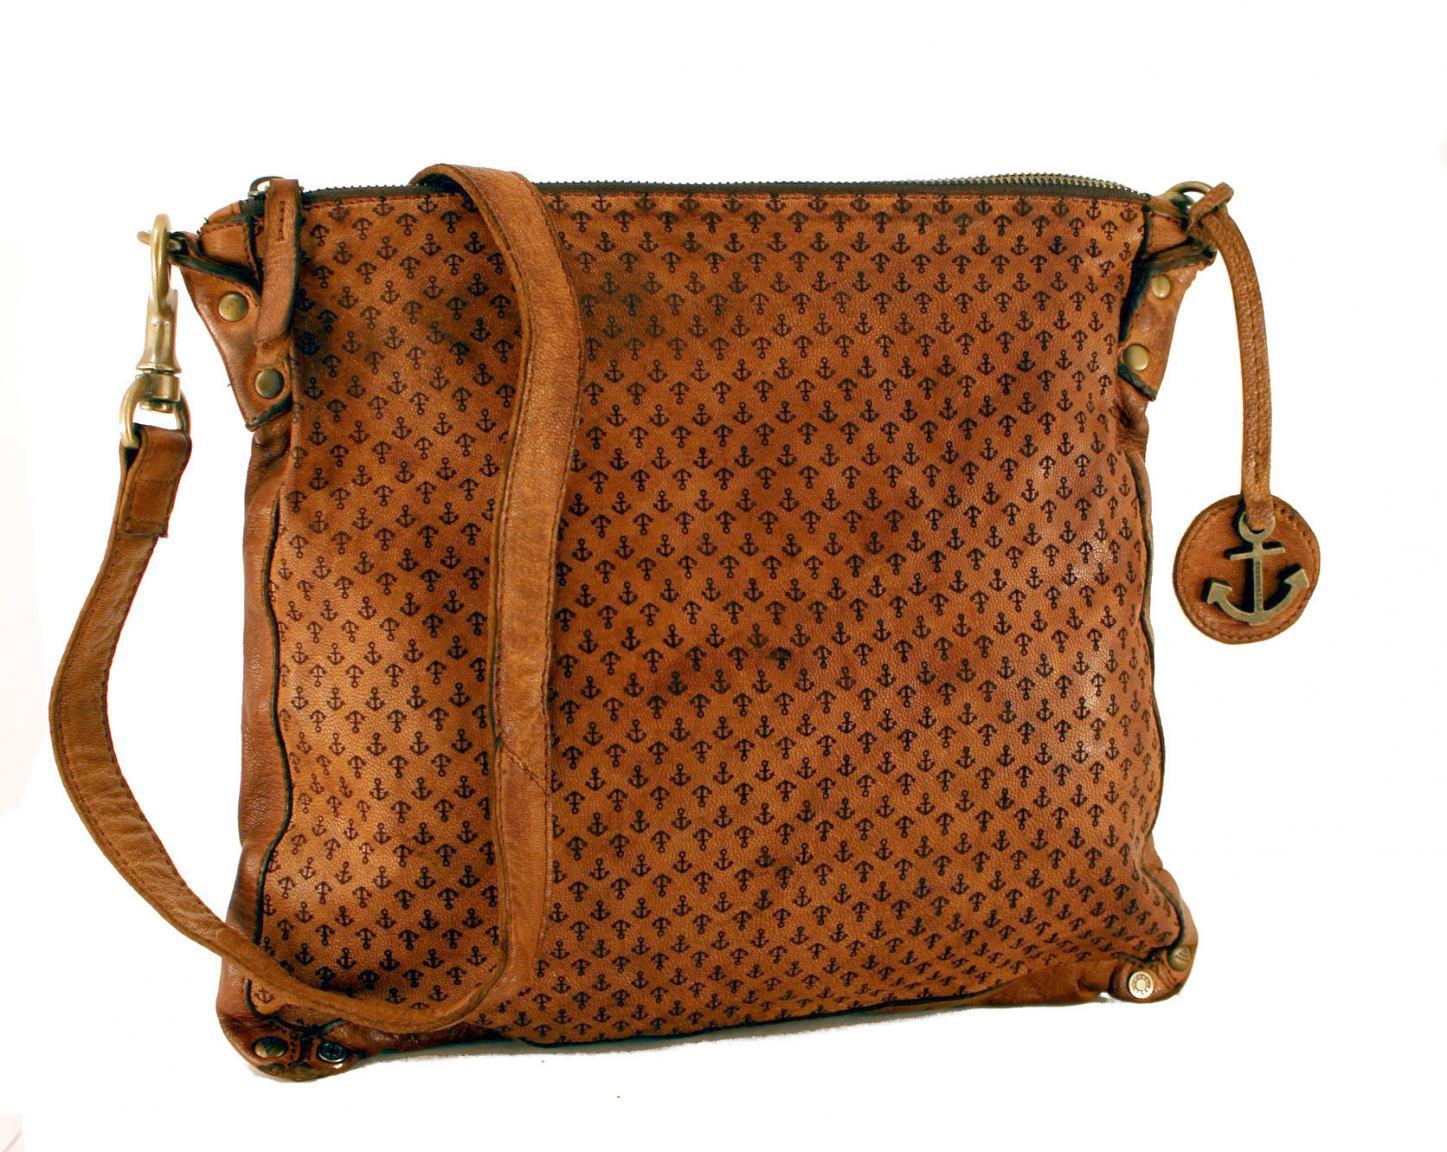 8f03c97f8518f Harbour 2nd Viktoria Ledertasche Umhängeriemen Cognac - Bags   more